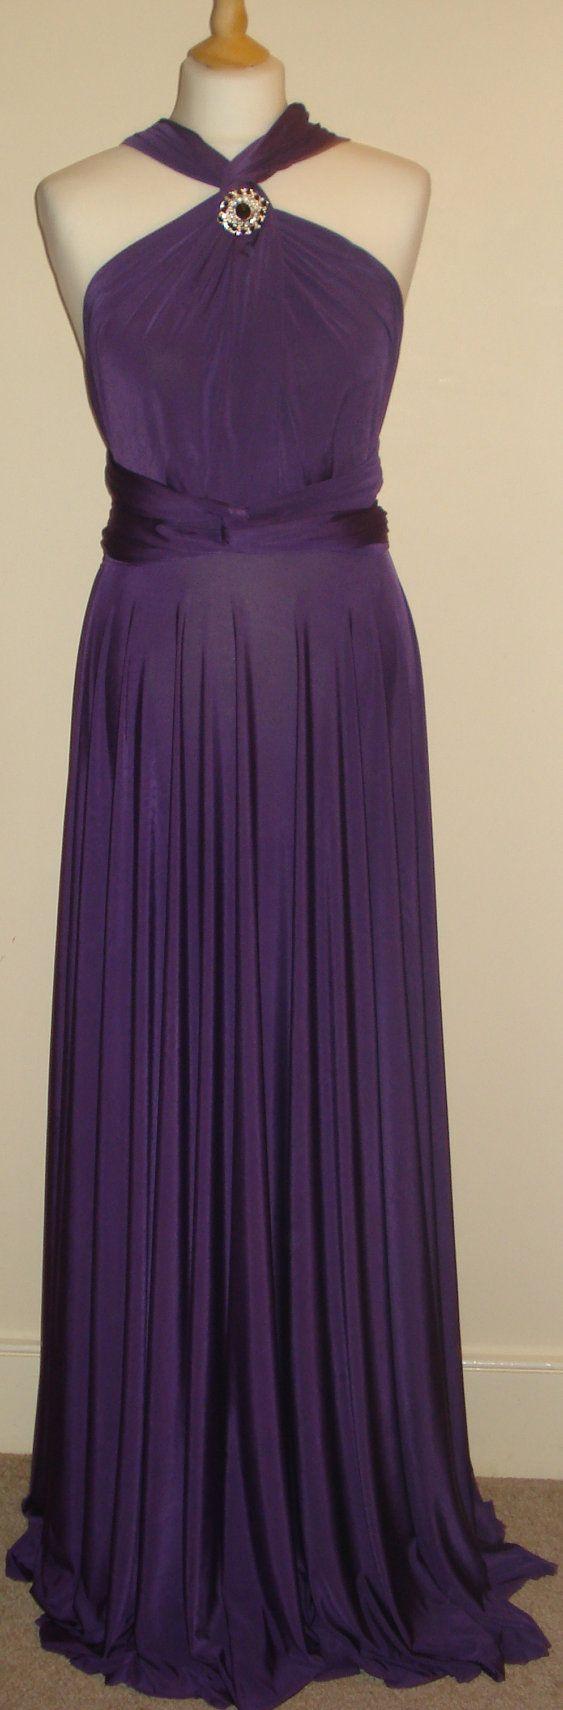 Light Aubergine Convertible Dress Infinity by stitchawayrose